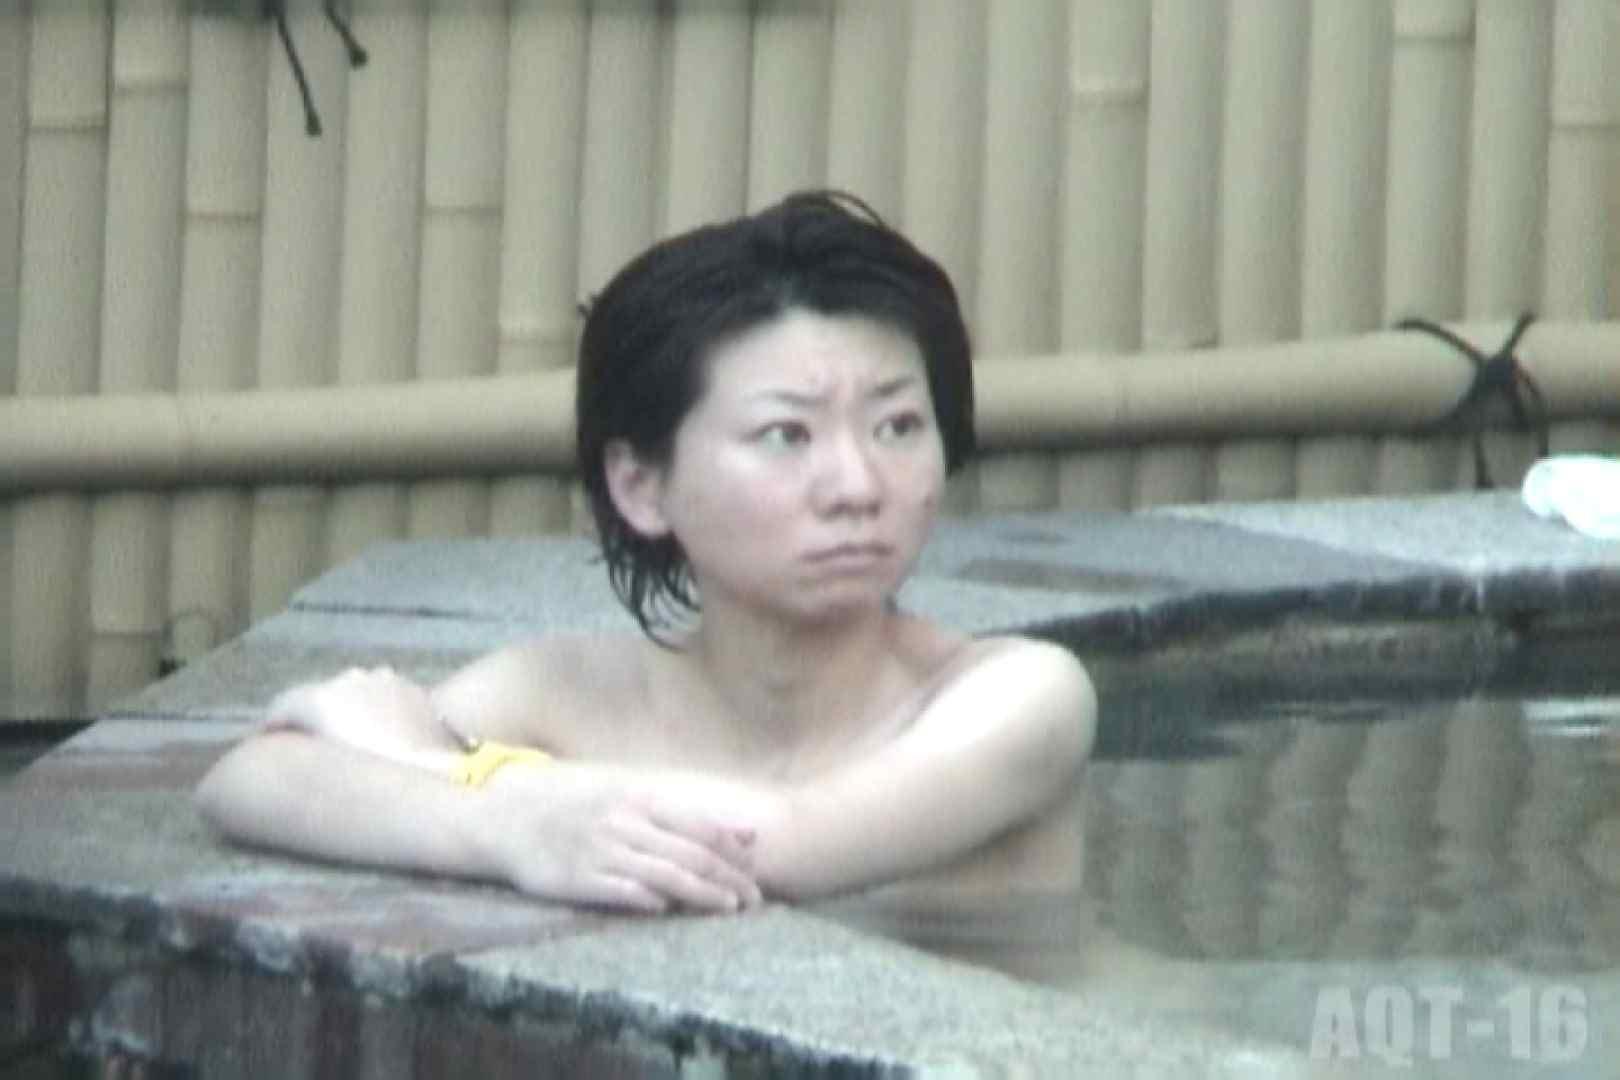 Aquaな露天風呂Vol.842 露天風呂編  82PIX 74